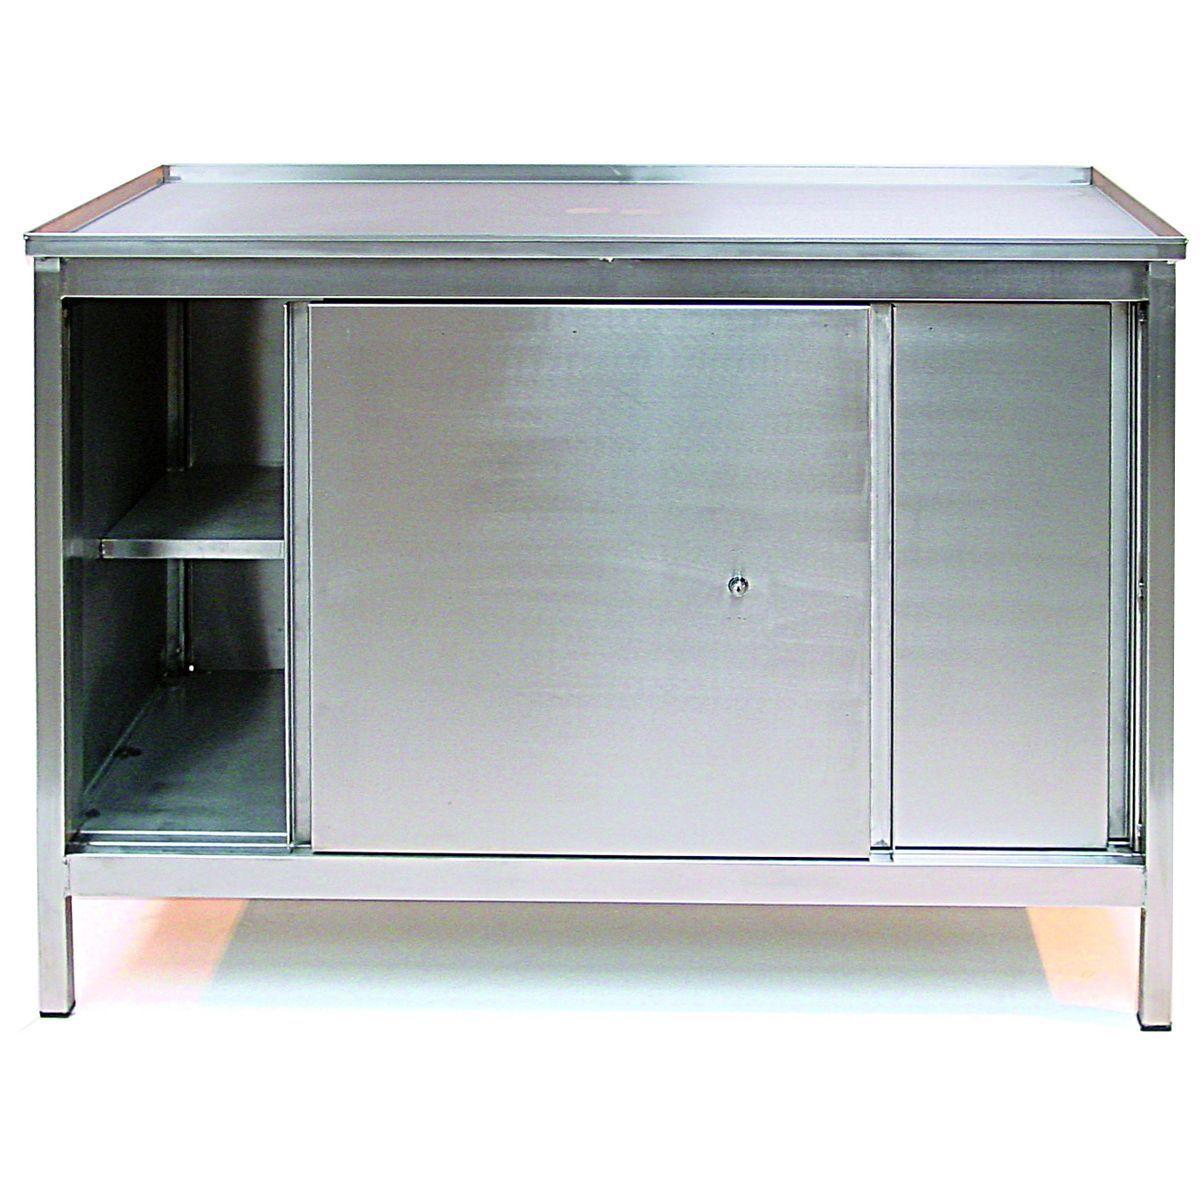 kitchen | New house ideas | Pinterest | Steel cupboard, Workshop ...